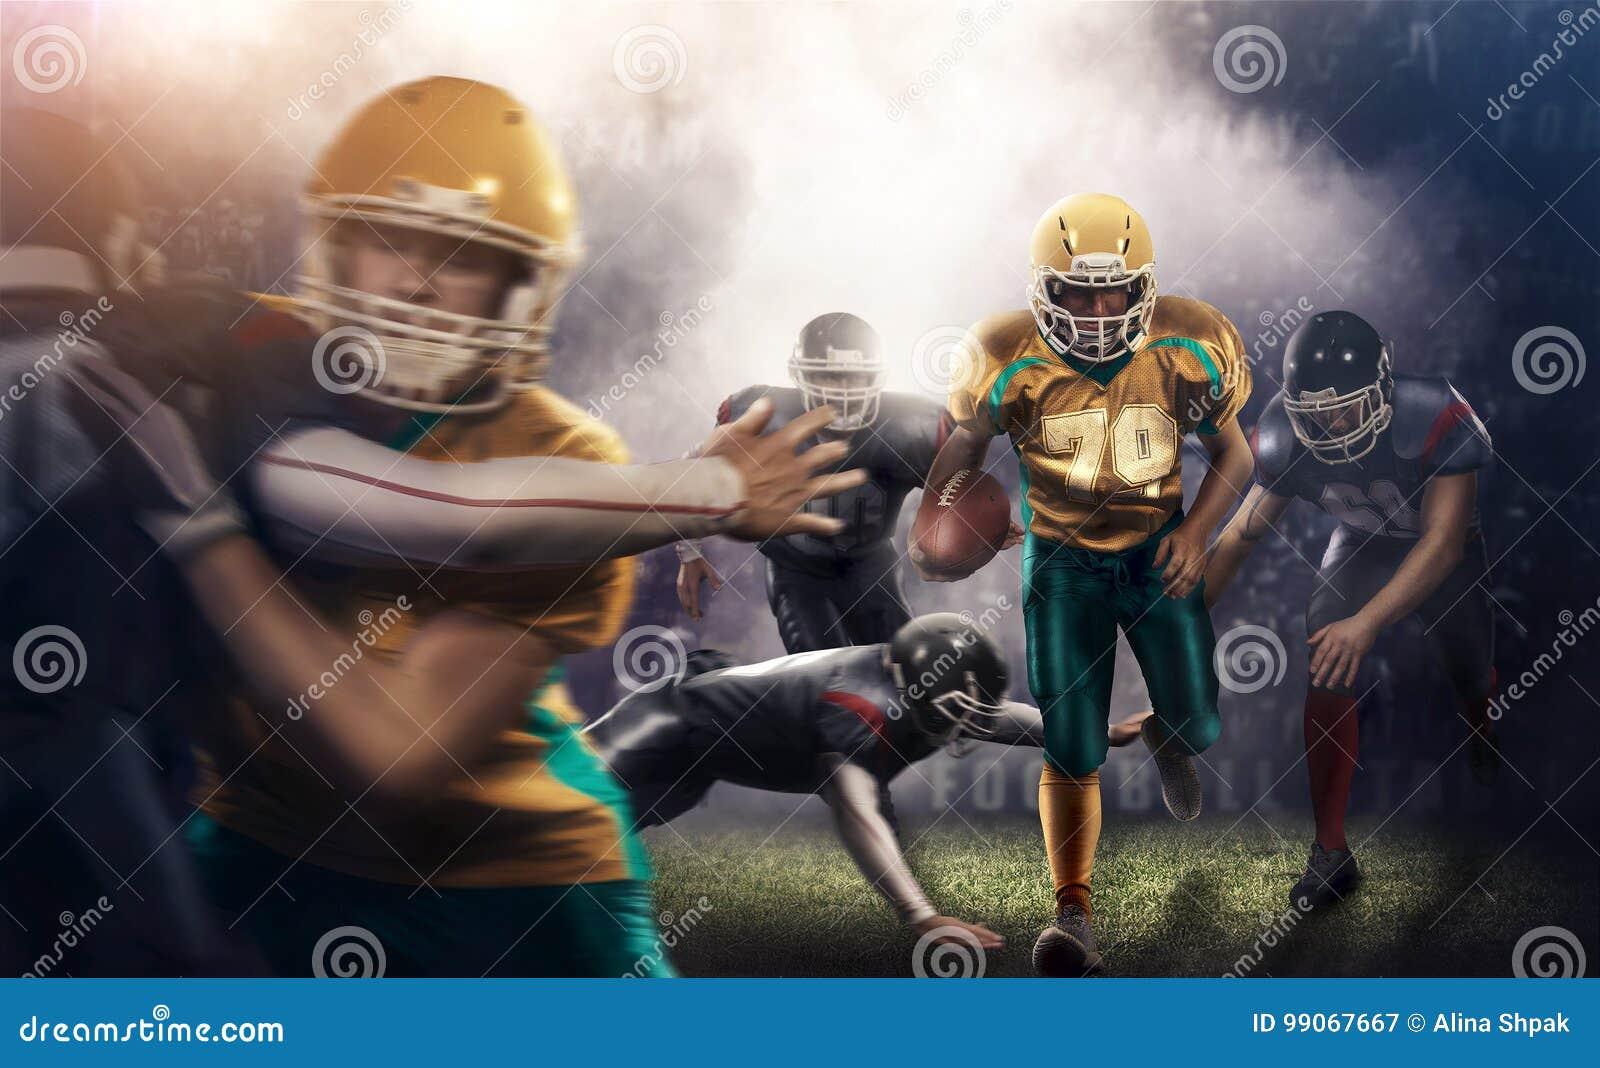 Зверское действие футбола на Спорт-арене 3d зрелые игроки с шариком